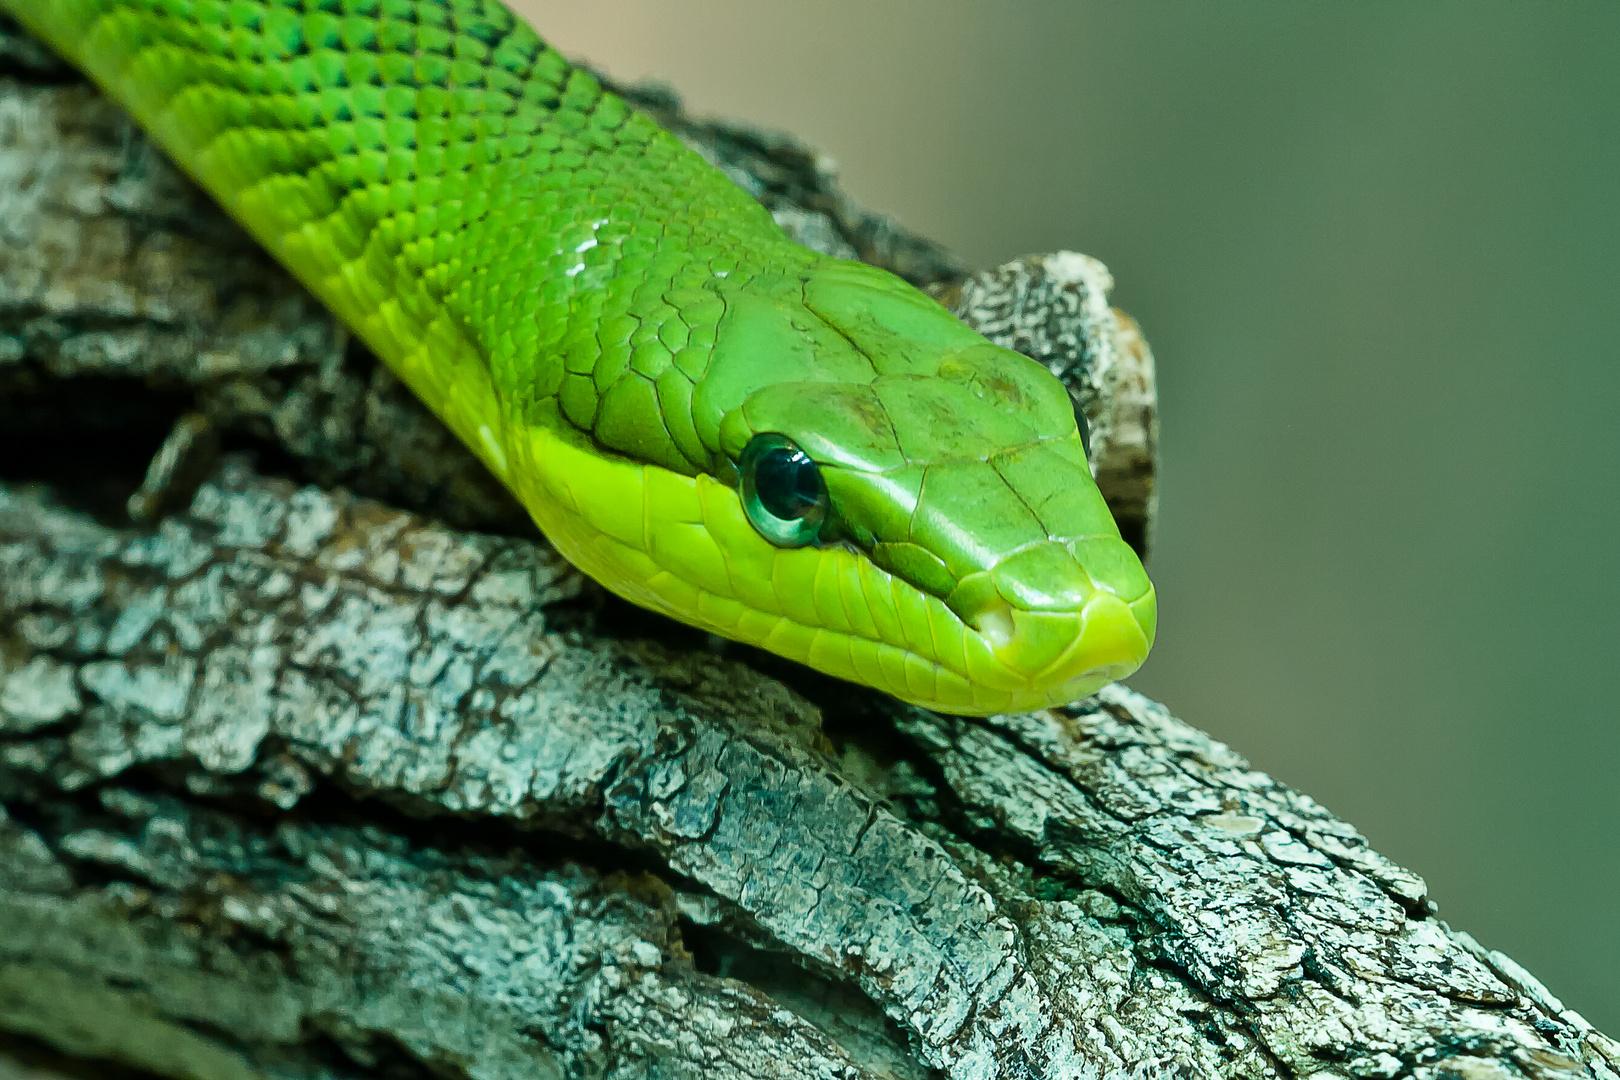 Die Grüne Mamba